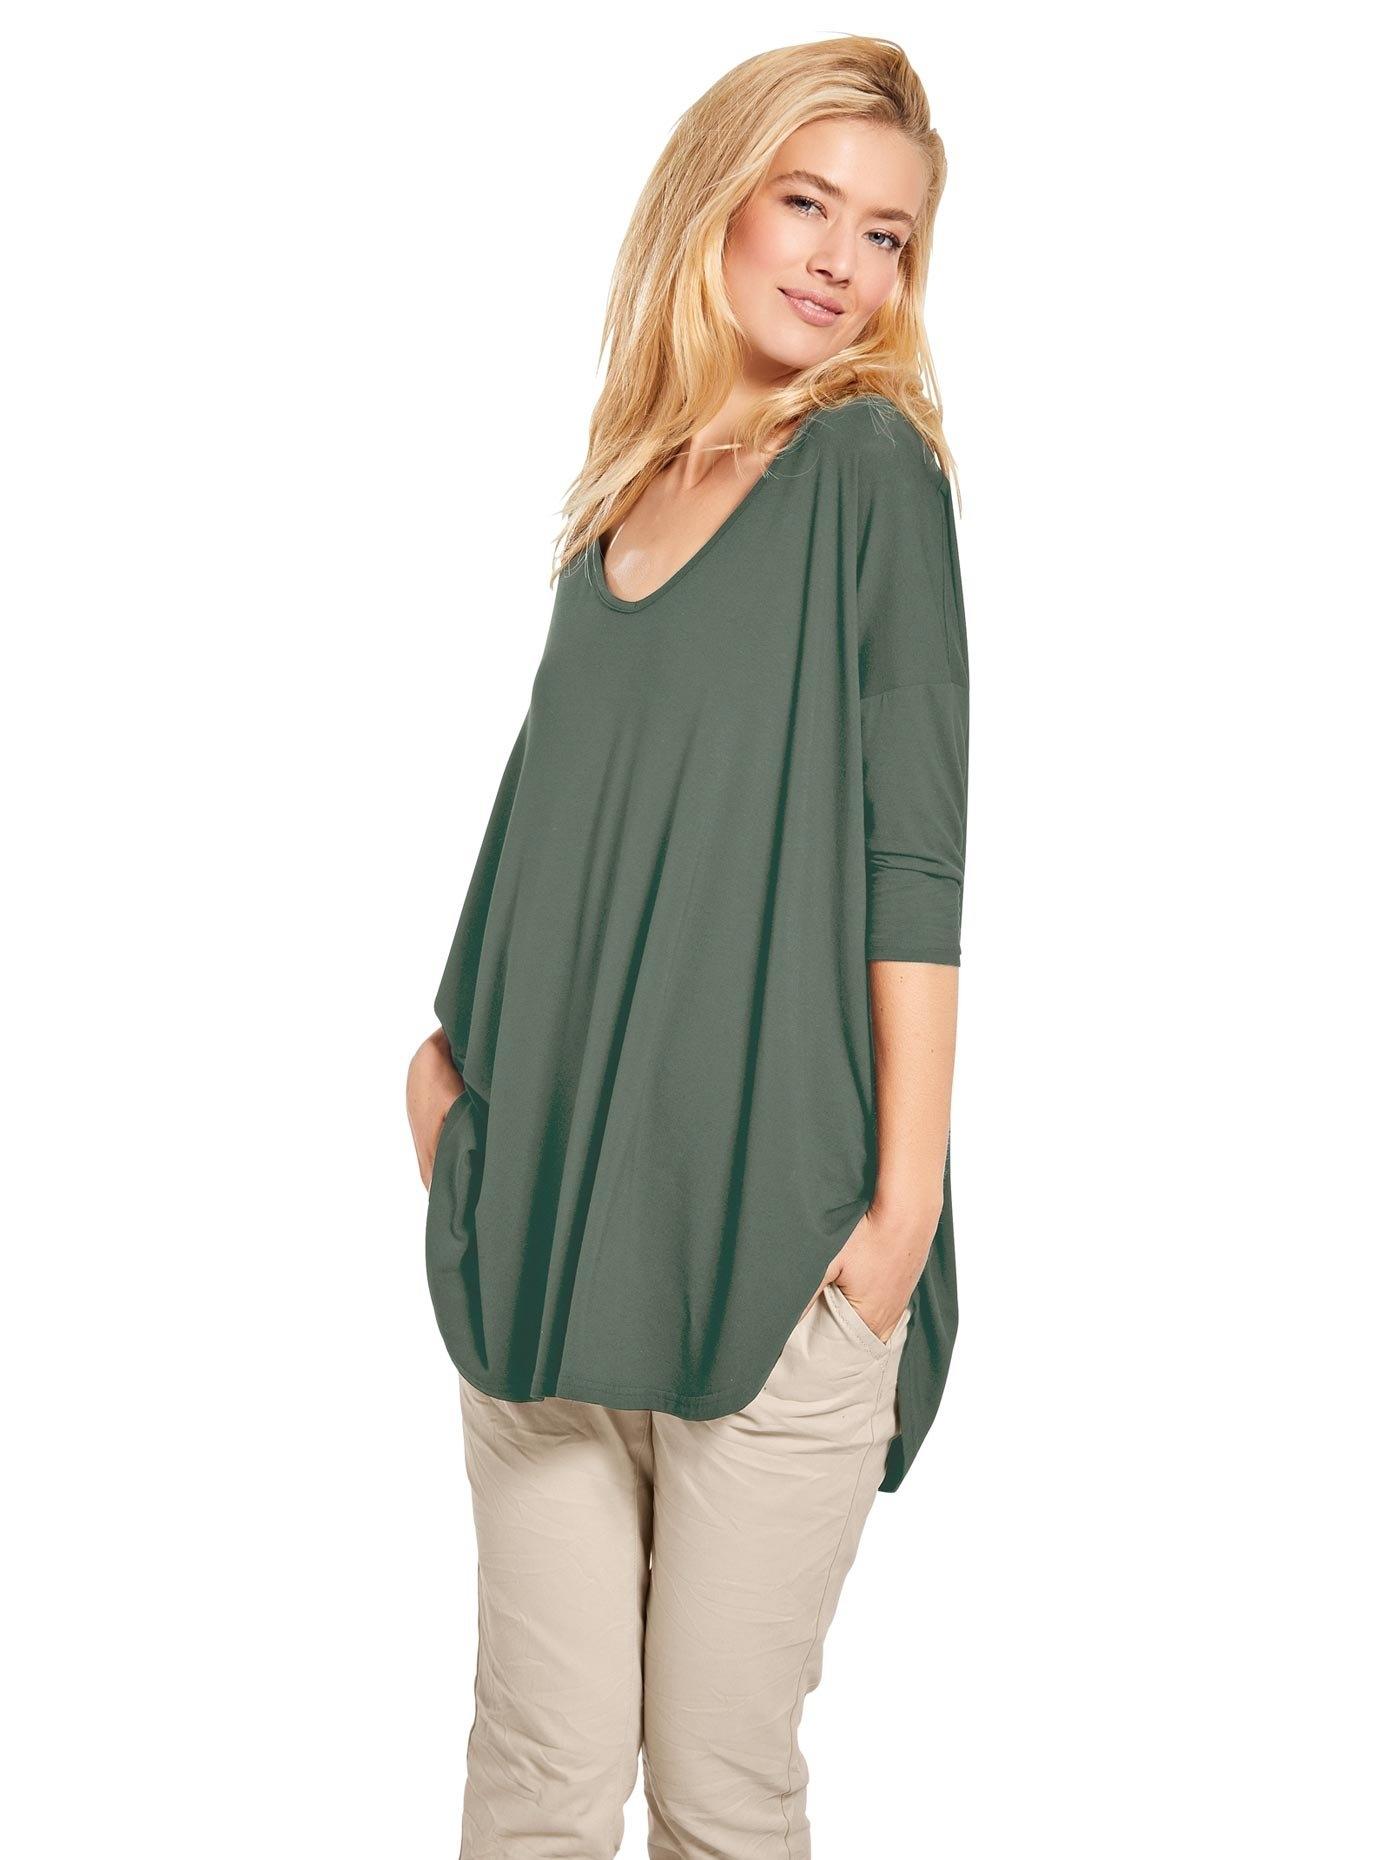 LINEA TESINI by Heine oversized shirt - gratis ruilen op otto.nl